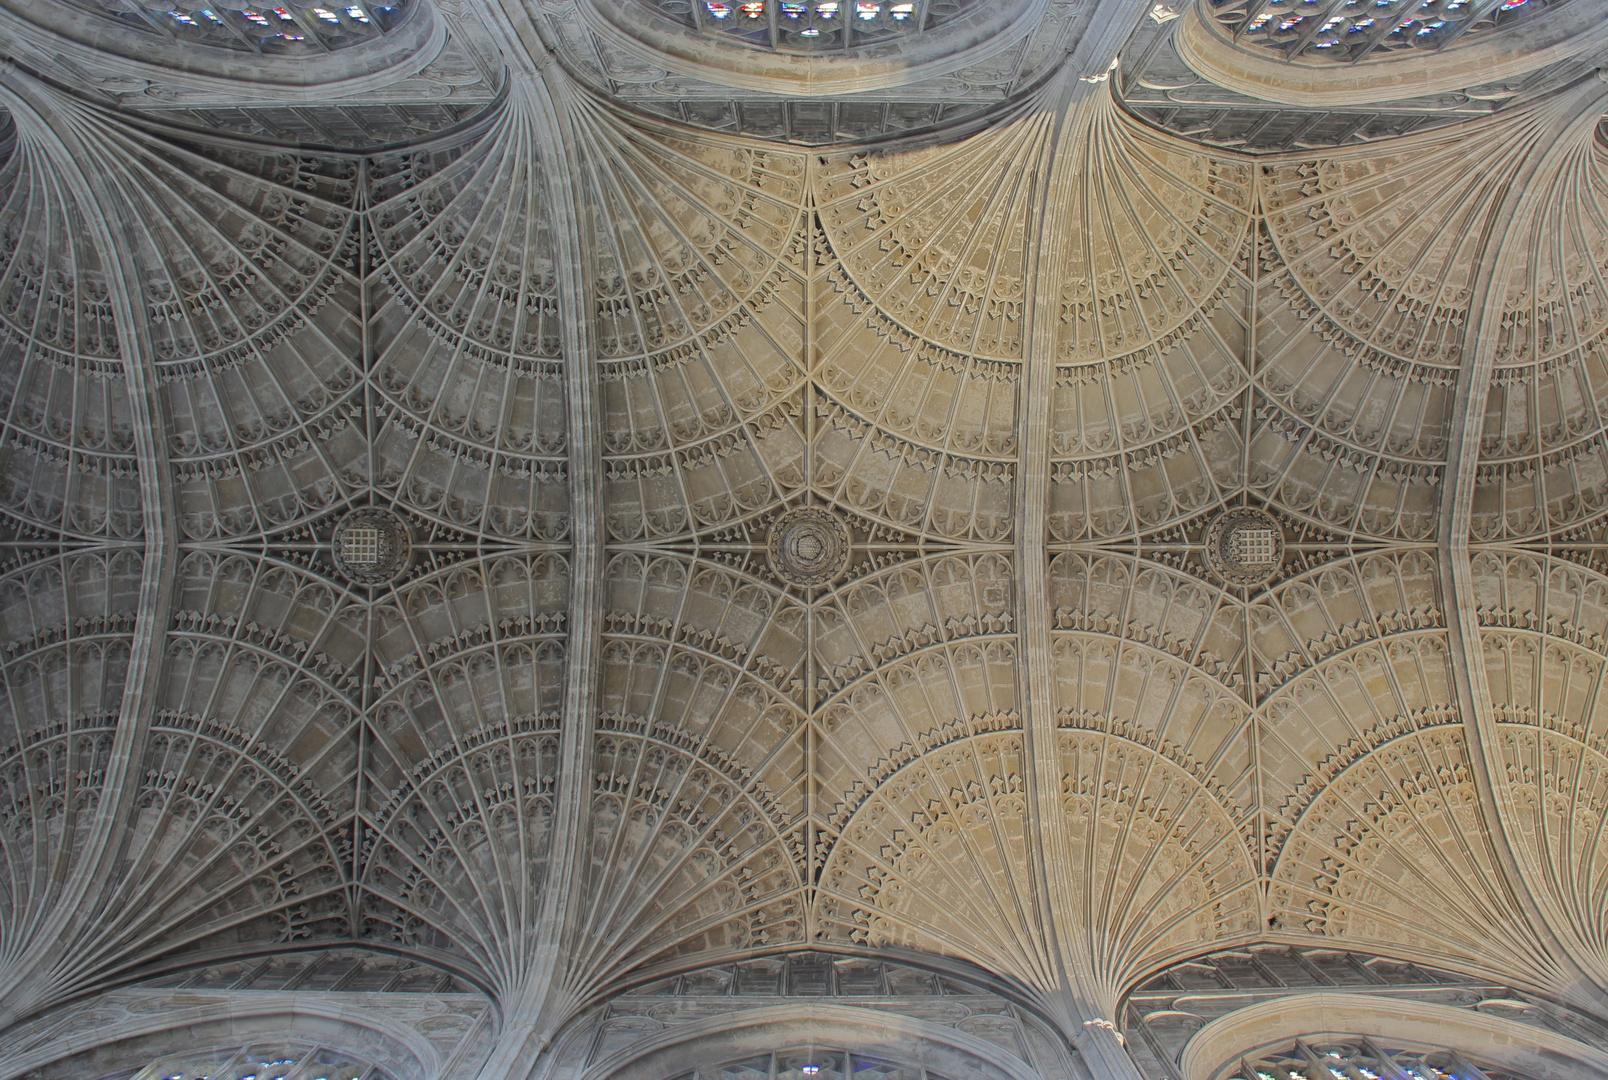 The royal web